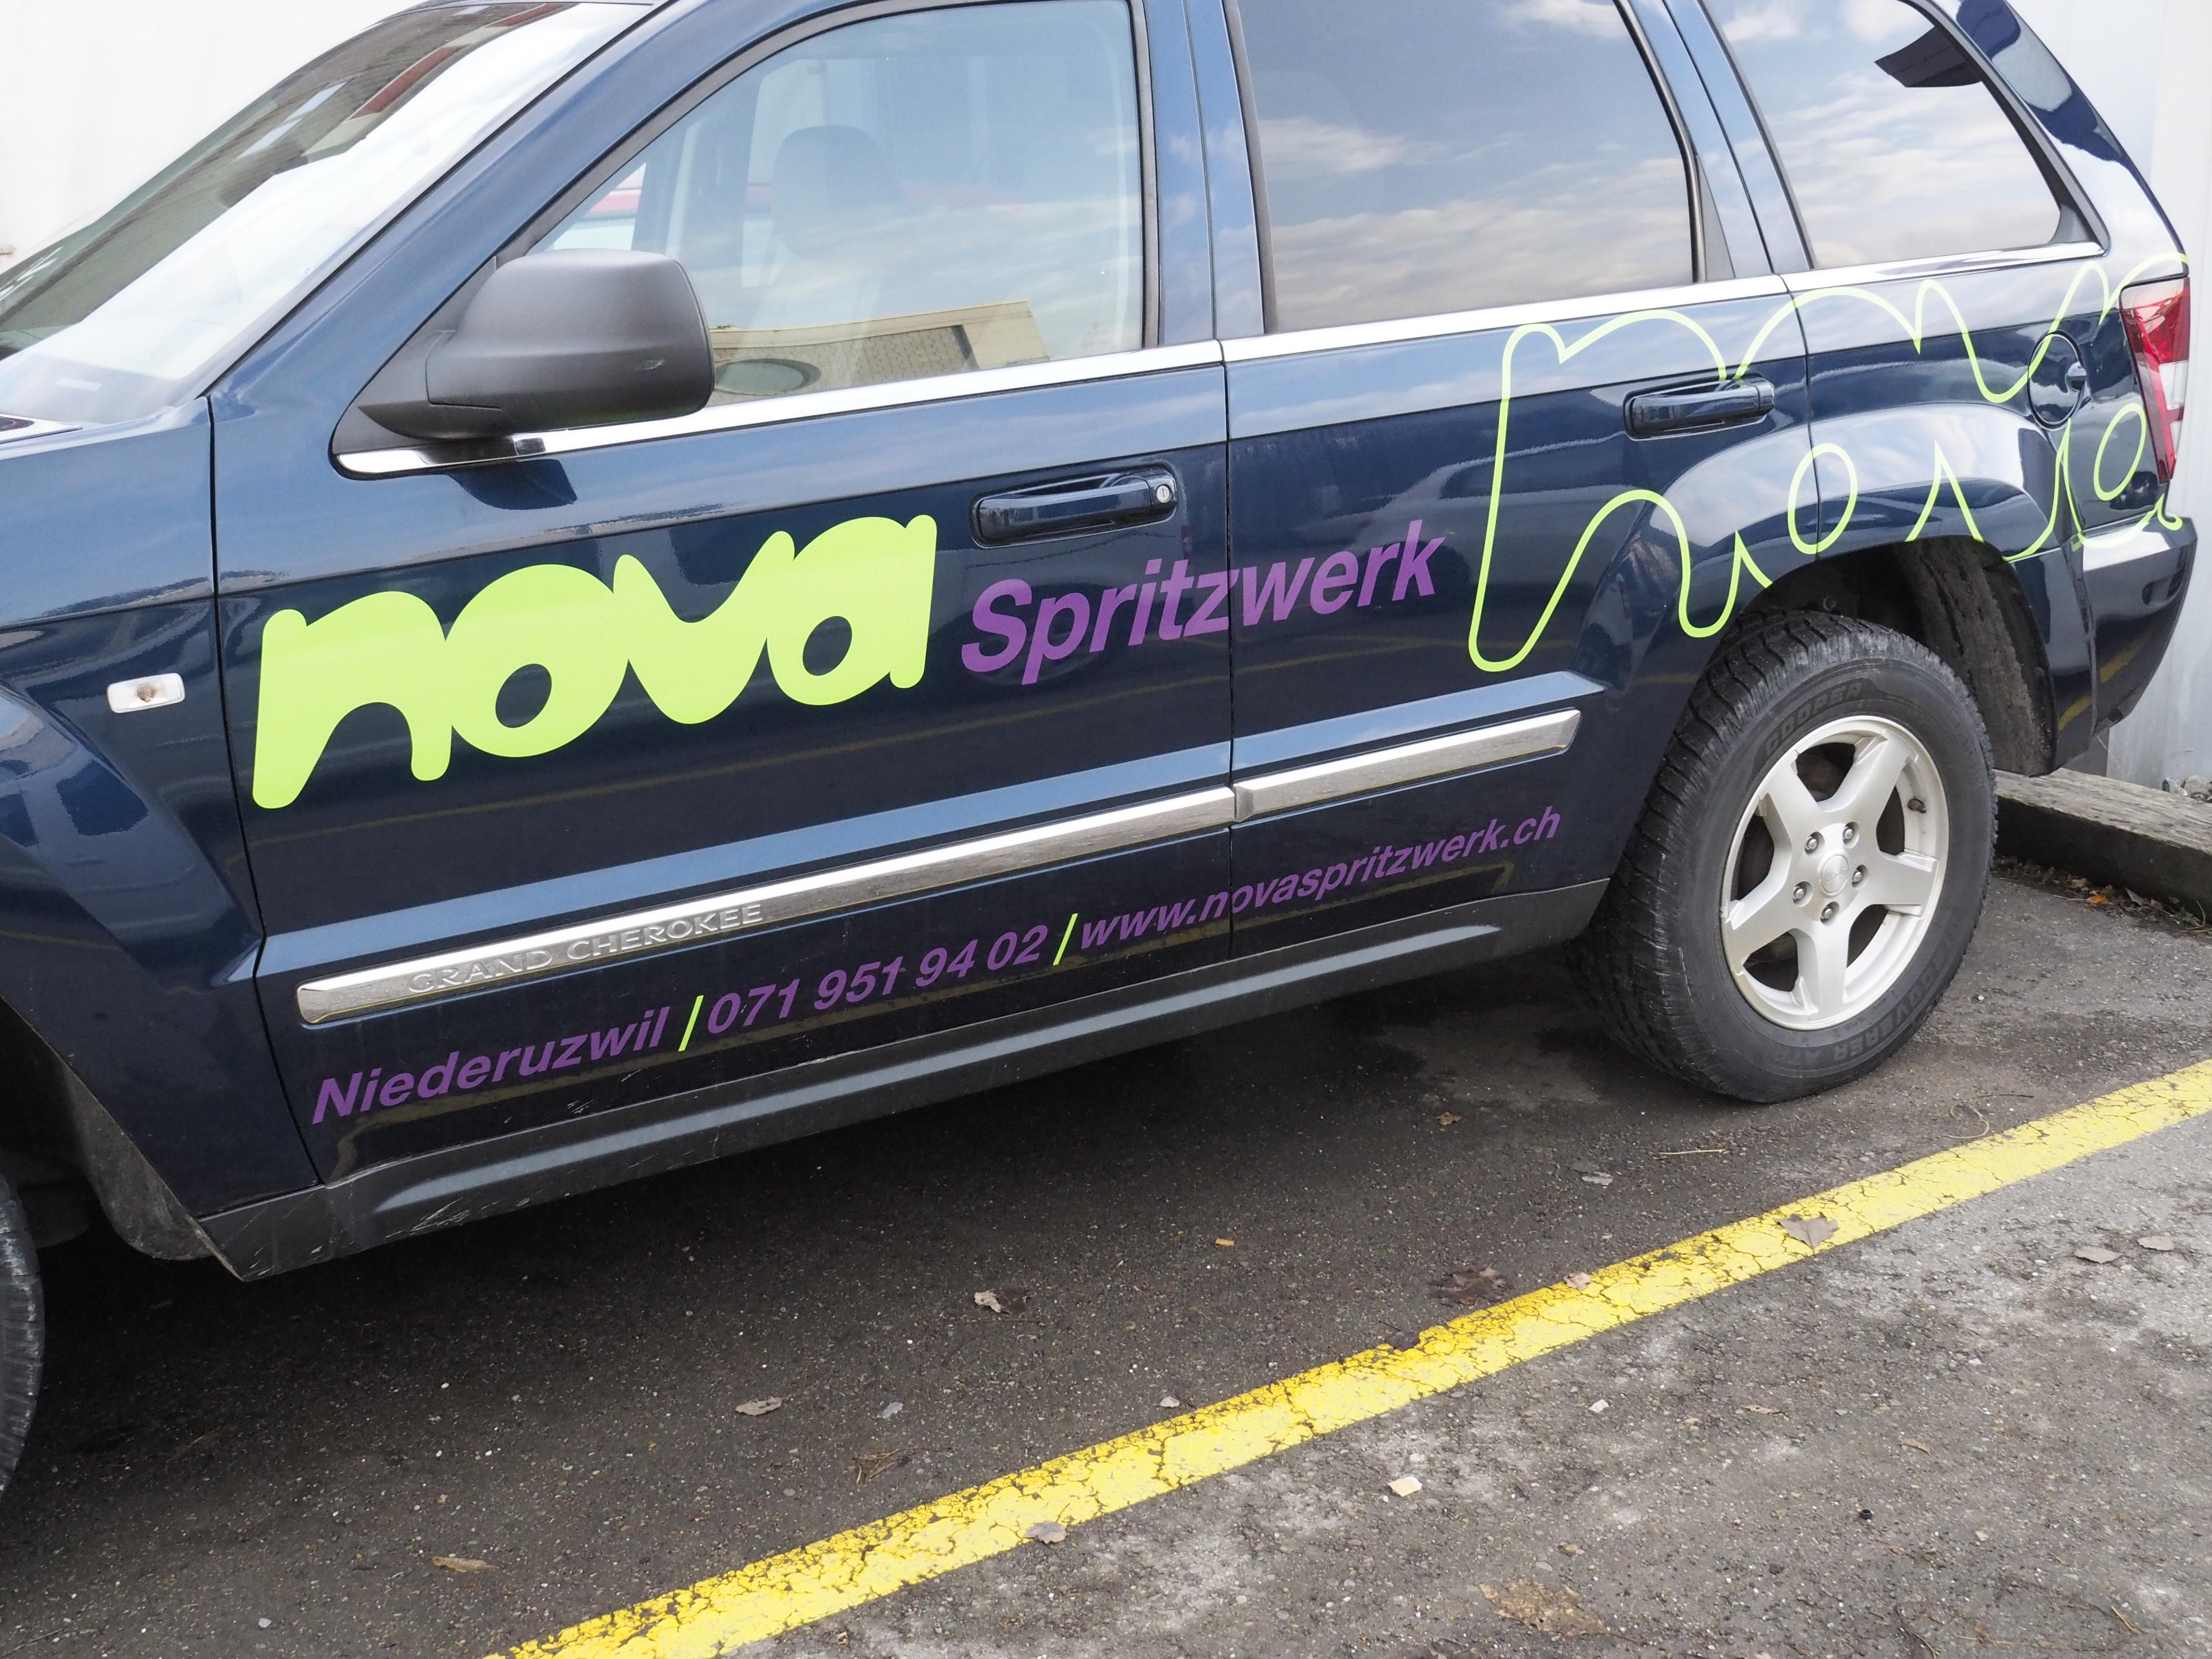 Nova Spritzwerk, Hummelweg 13, 9244 Niederuzwil